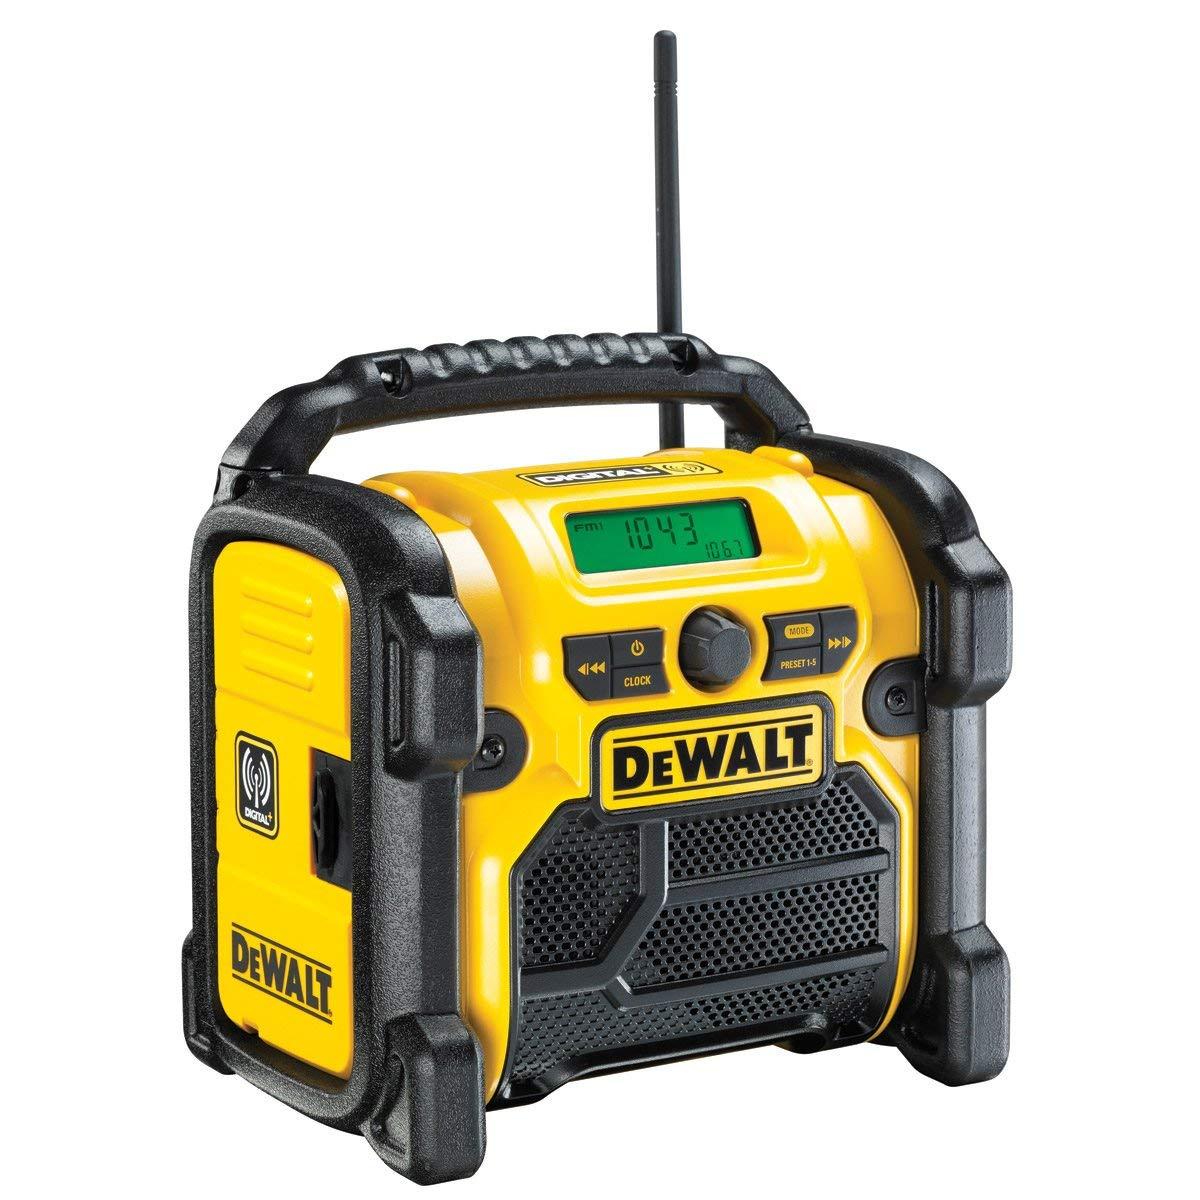 DeWalt DCR020-GB Compact Jobsite DAB Radio now £79.99 delivered at Amazon